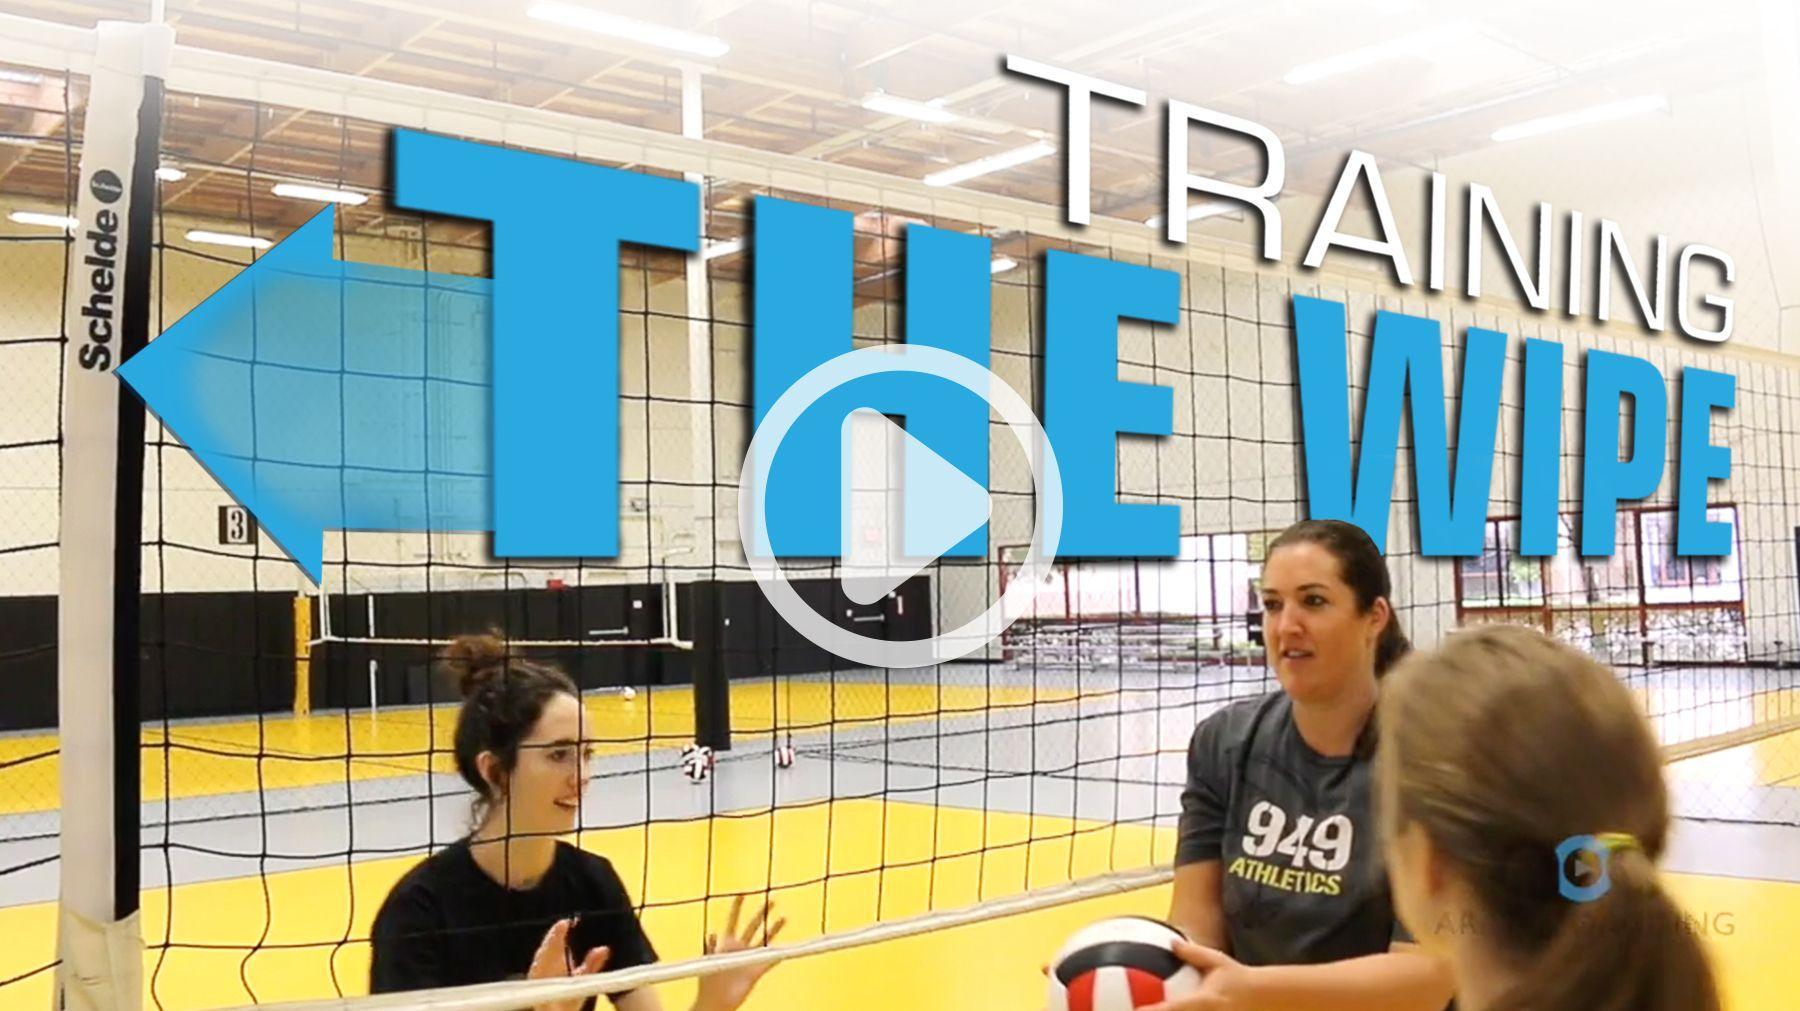 Training The Wipe The Art Of Coaching Volleyball Volleyball Training Volleyball Workouts Volleyball Drills